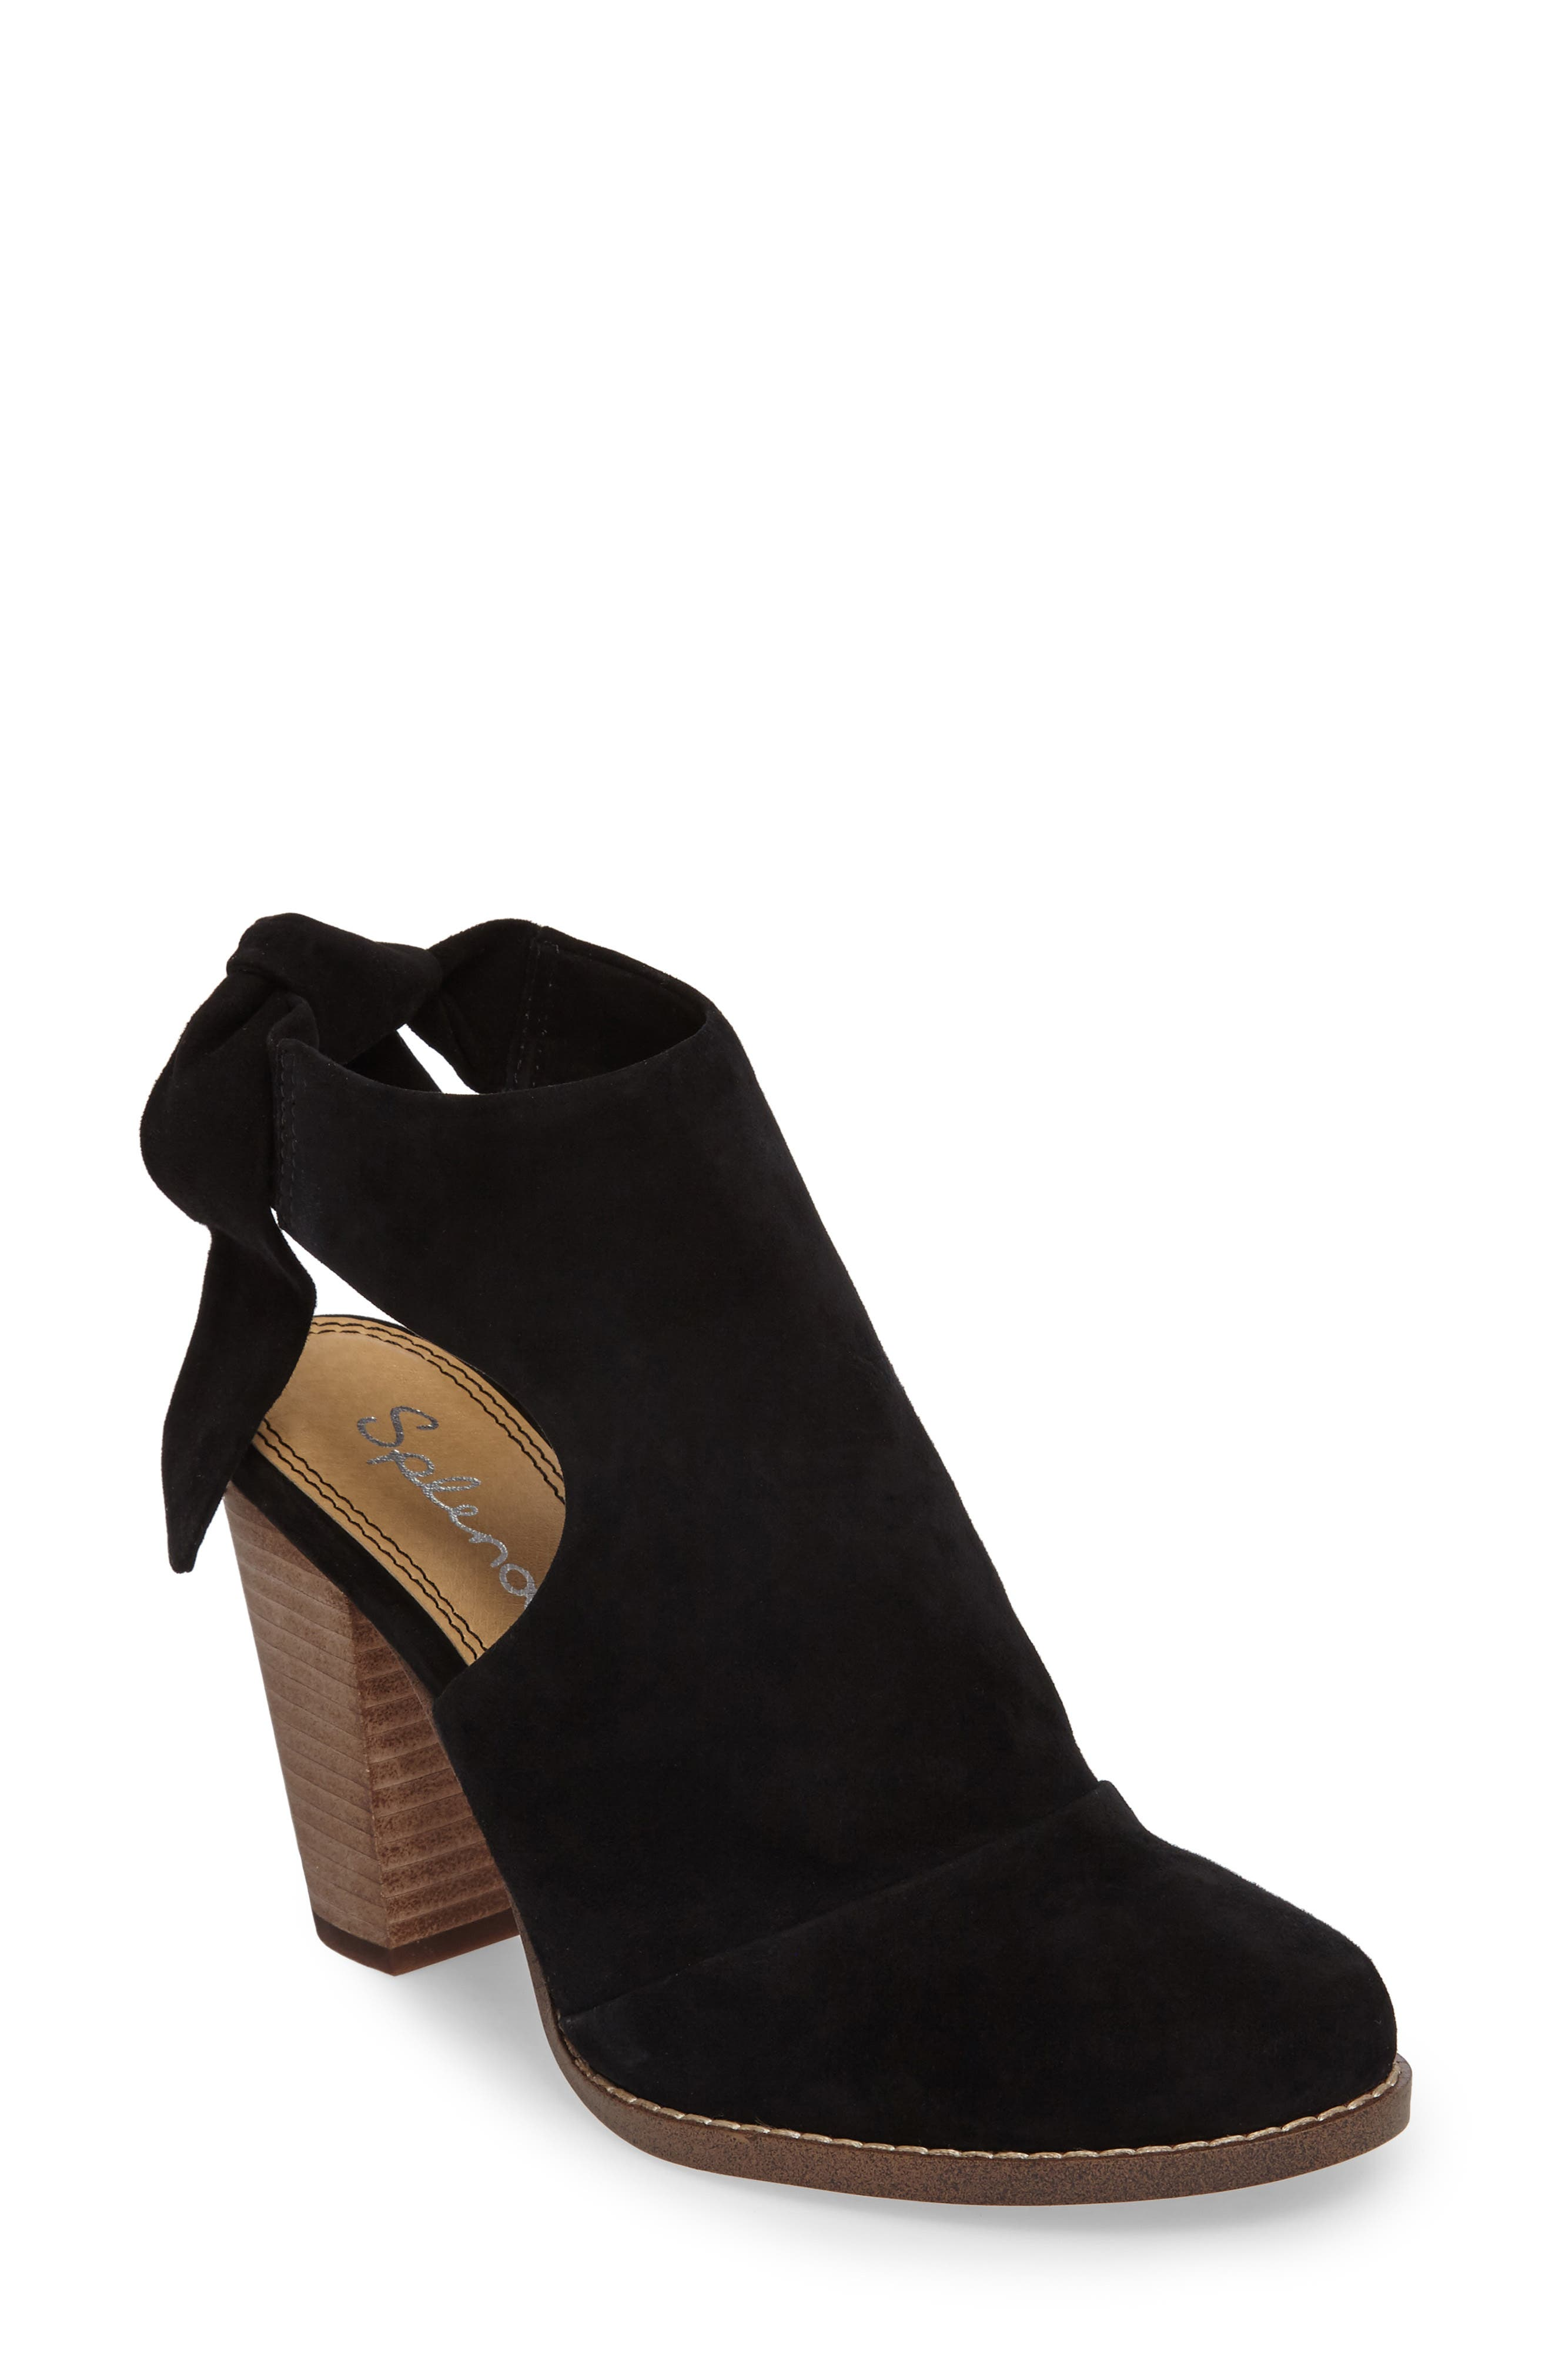 Alternate Image 1 Selected - Splendid Danae Stacked Heel Bootie (Women)